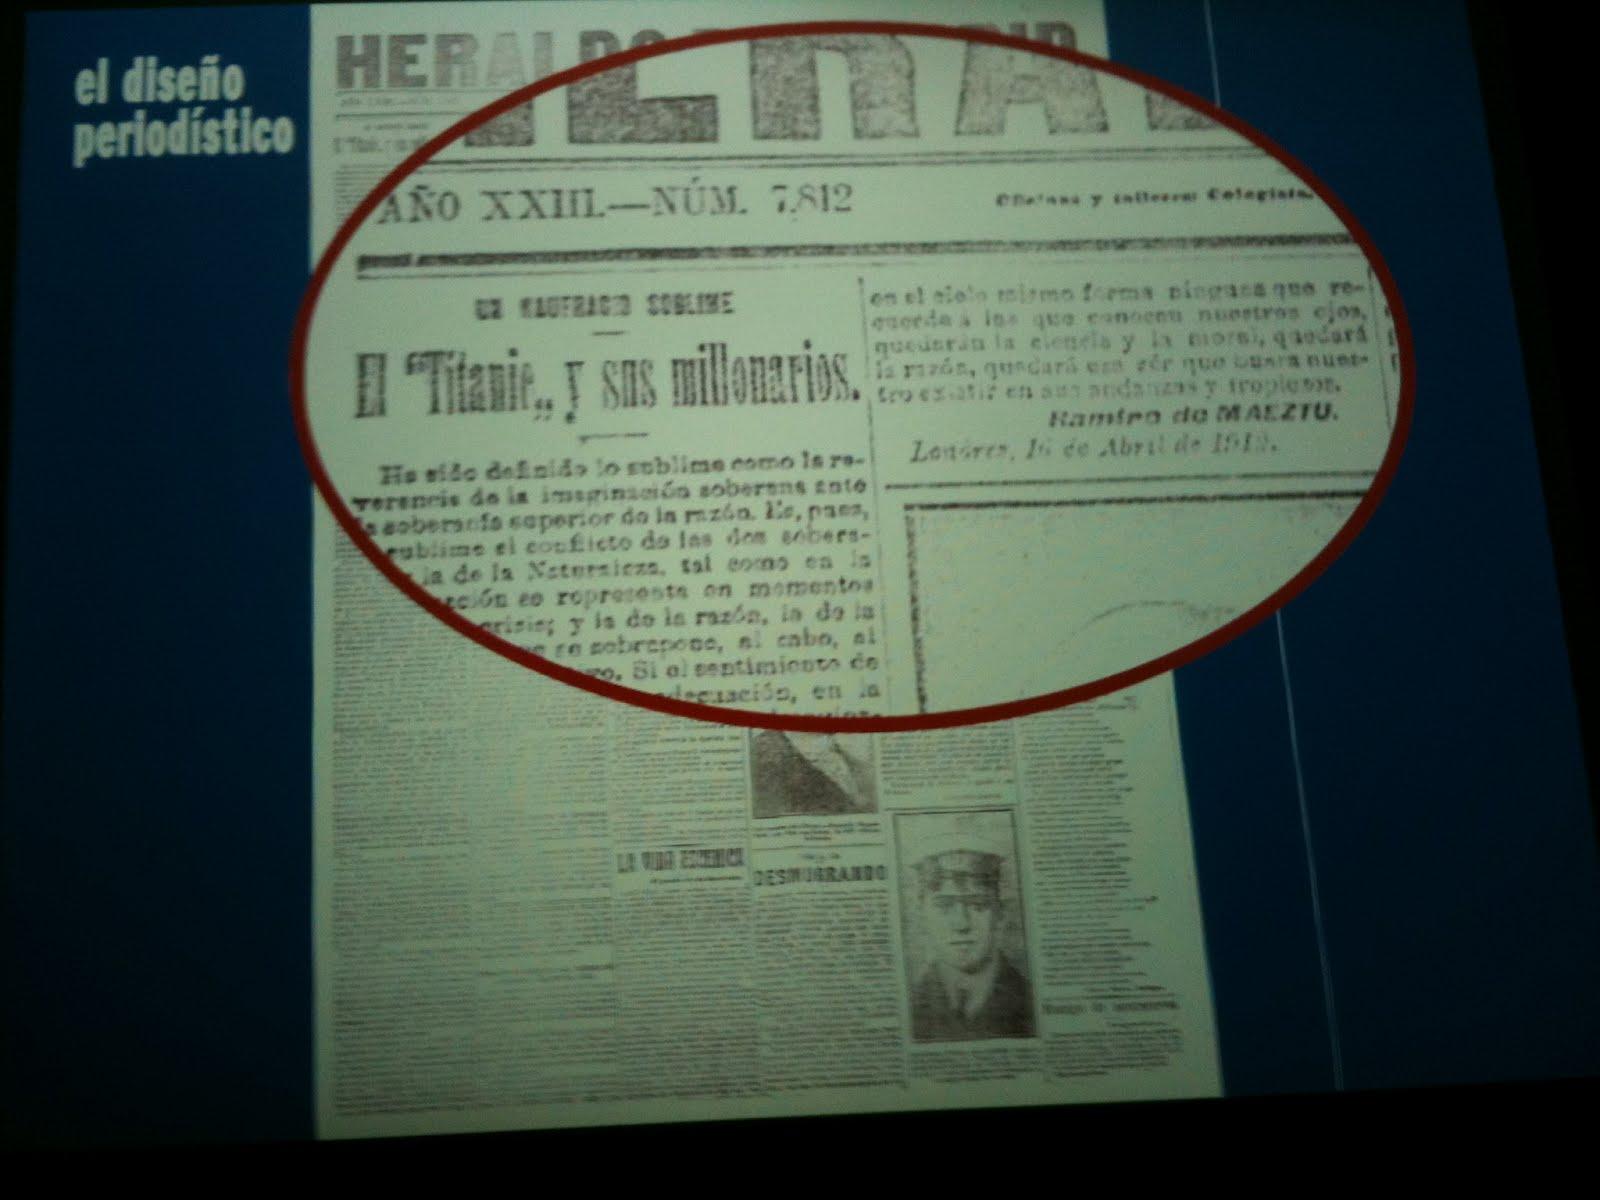 encajabaja   Diseño periodístico, Prensa: Noticias del \'Titanic\'